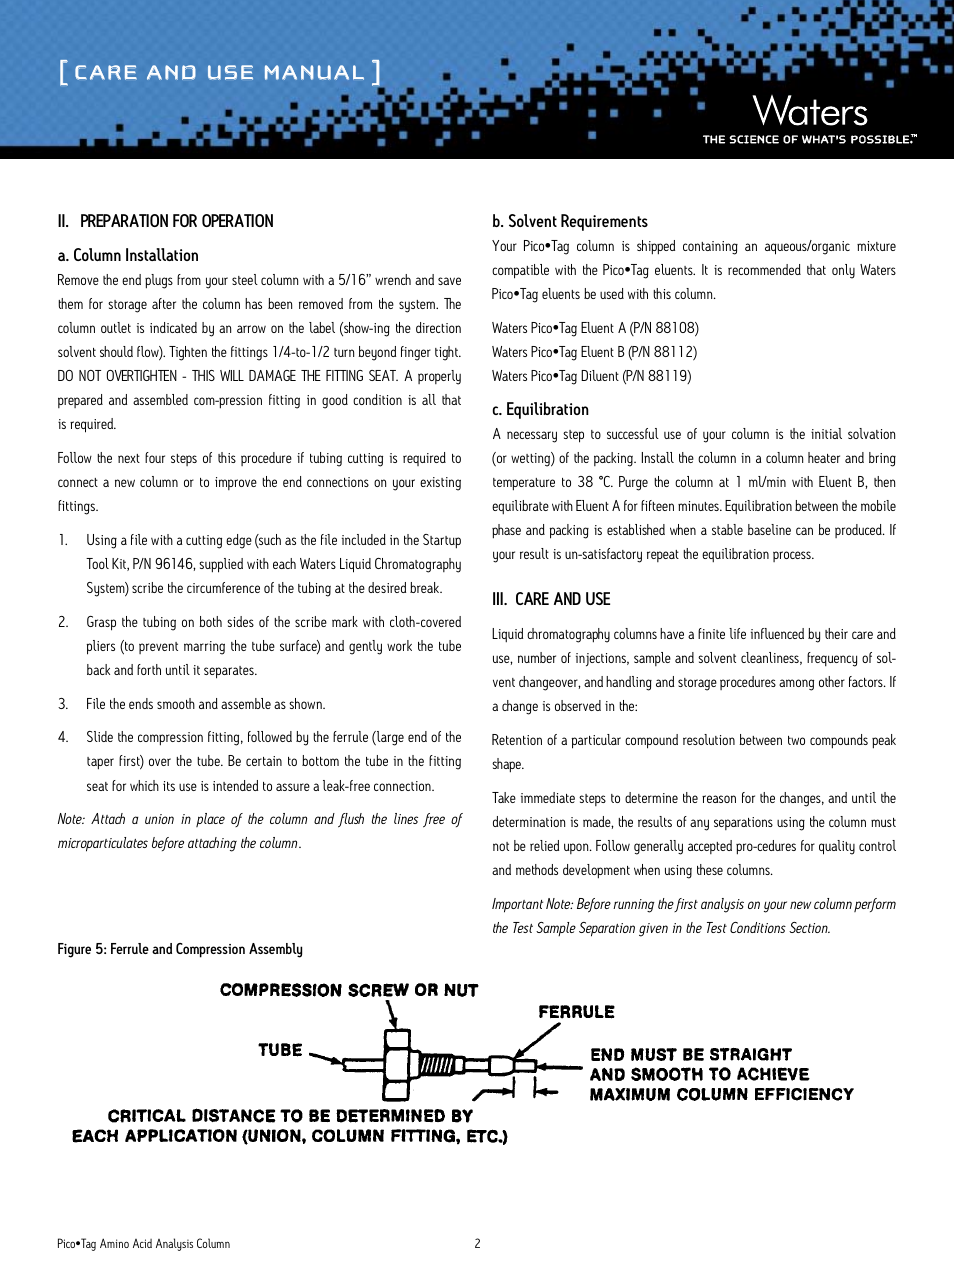 Fatty Acid Analysis Manual Guide